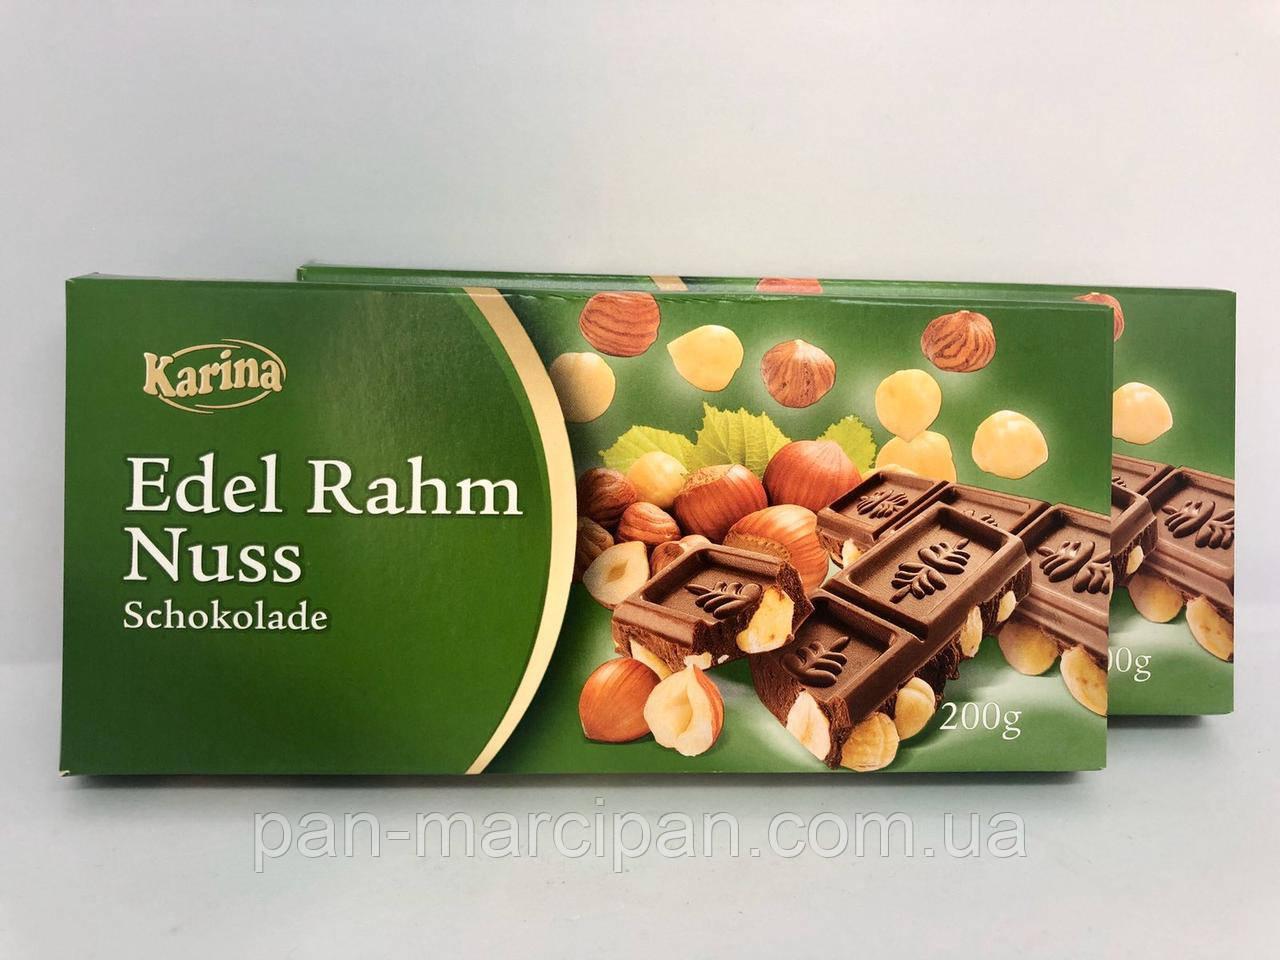 Шоколад Karina Edel Rahm Nuss 200 г